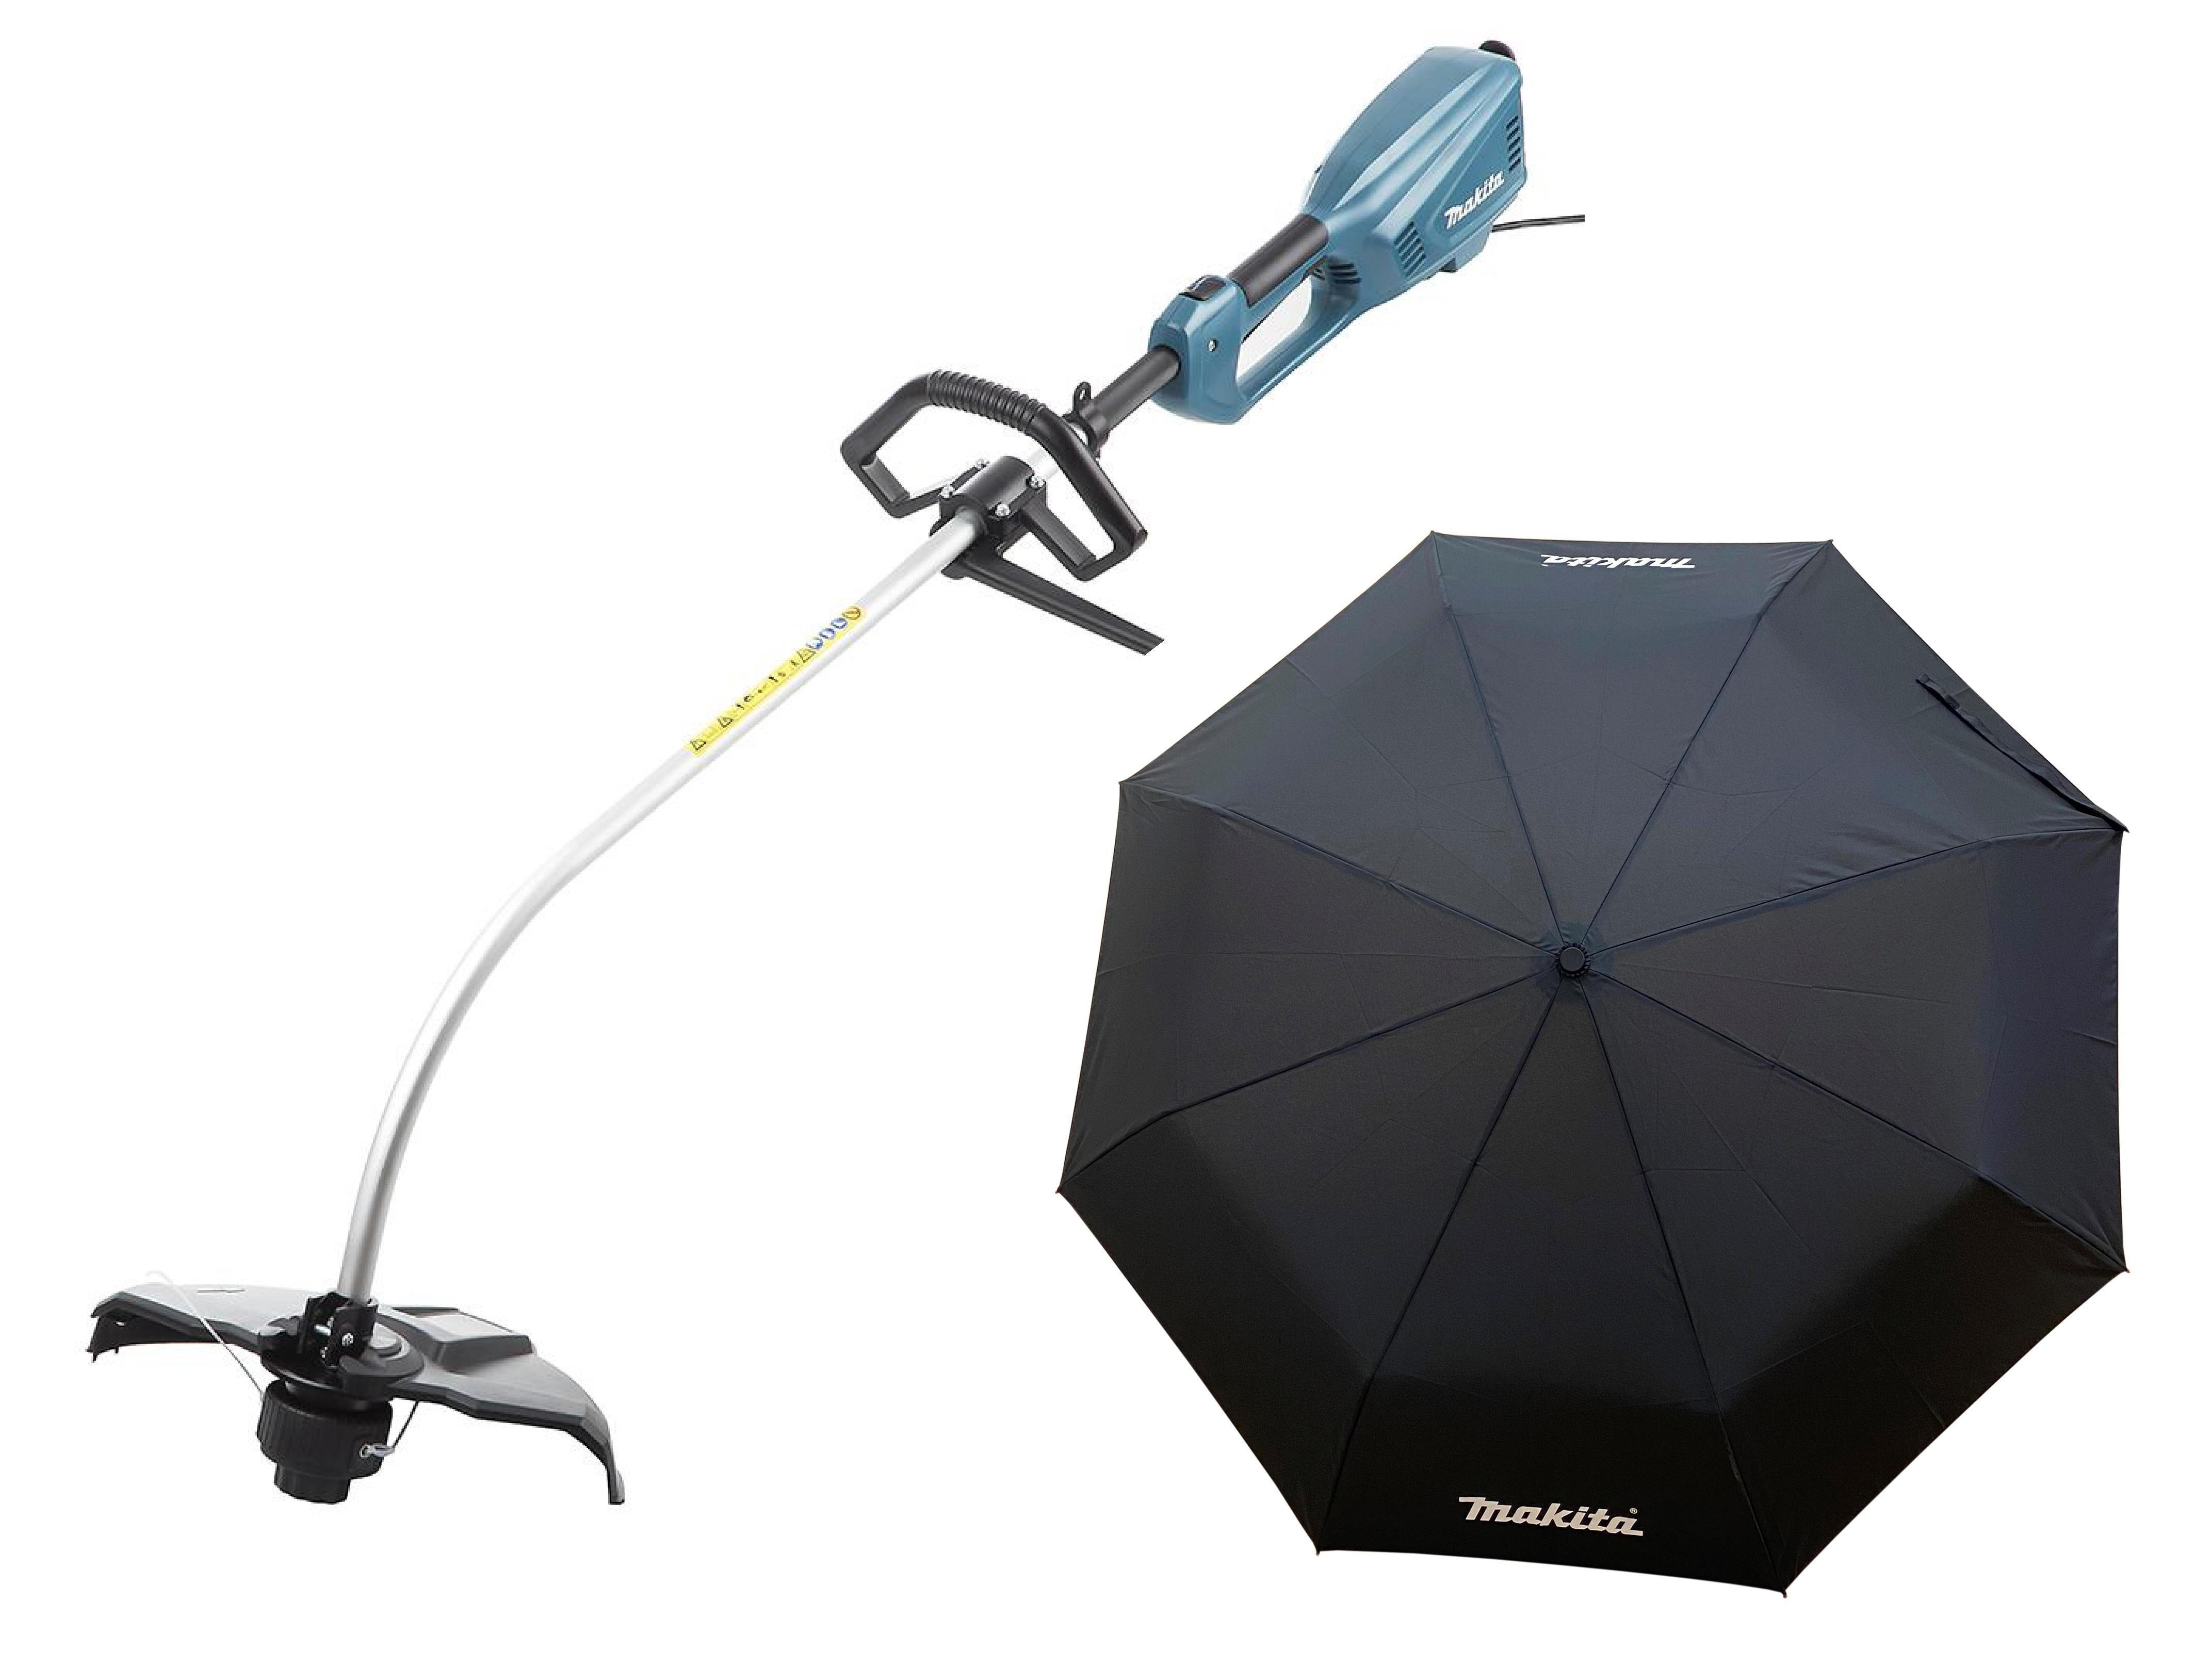 Набор Makita Триммер ur3500 +Зонт складной pgh-180150